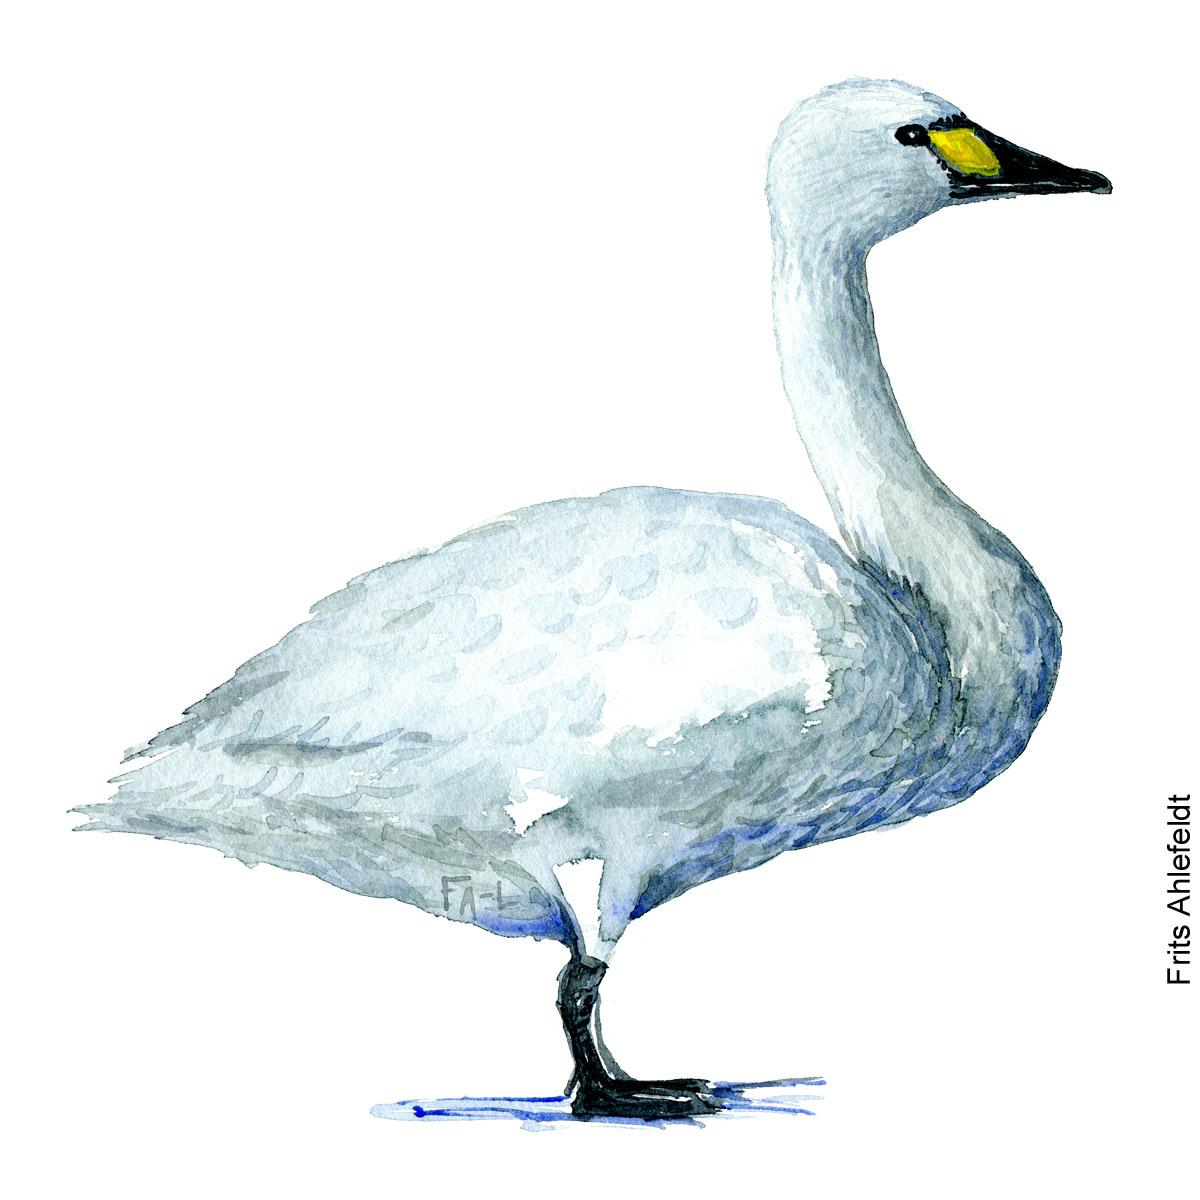 Tundra swan. Bird watercolor illustration handmade by Frits Ahlefeldt